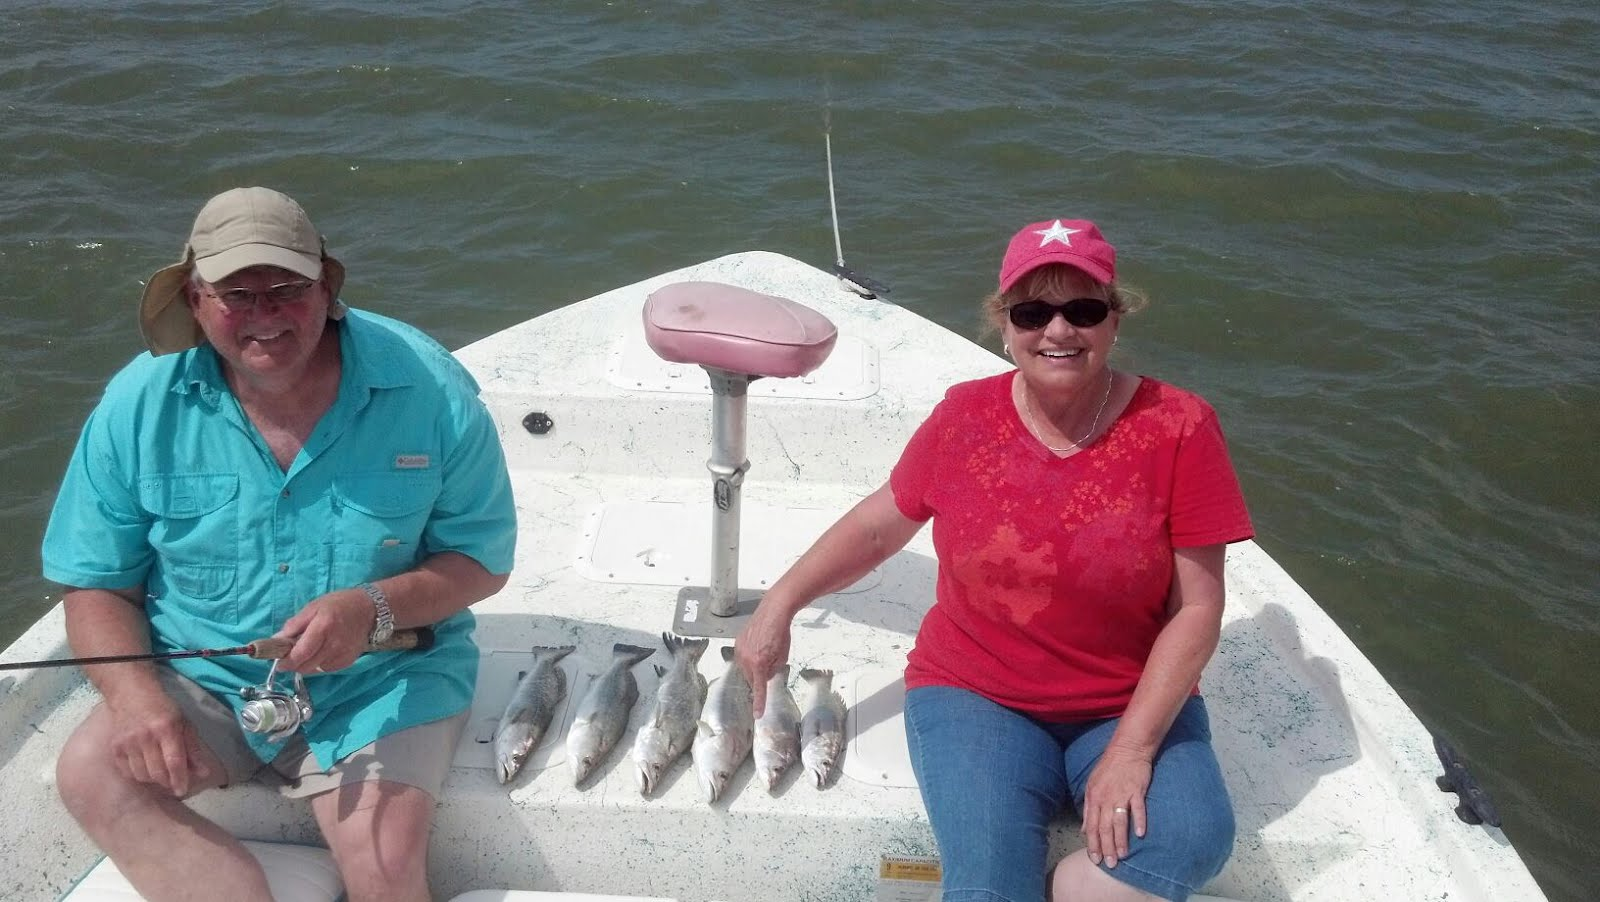 Galveston bay texas and sabine lake fishing reports may 2012 for Fishing report texas